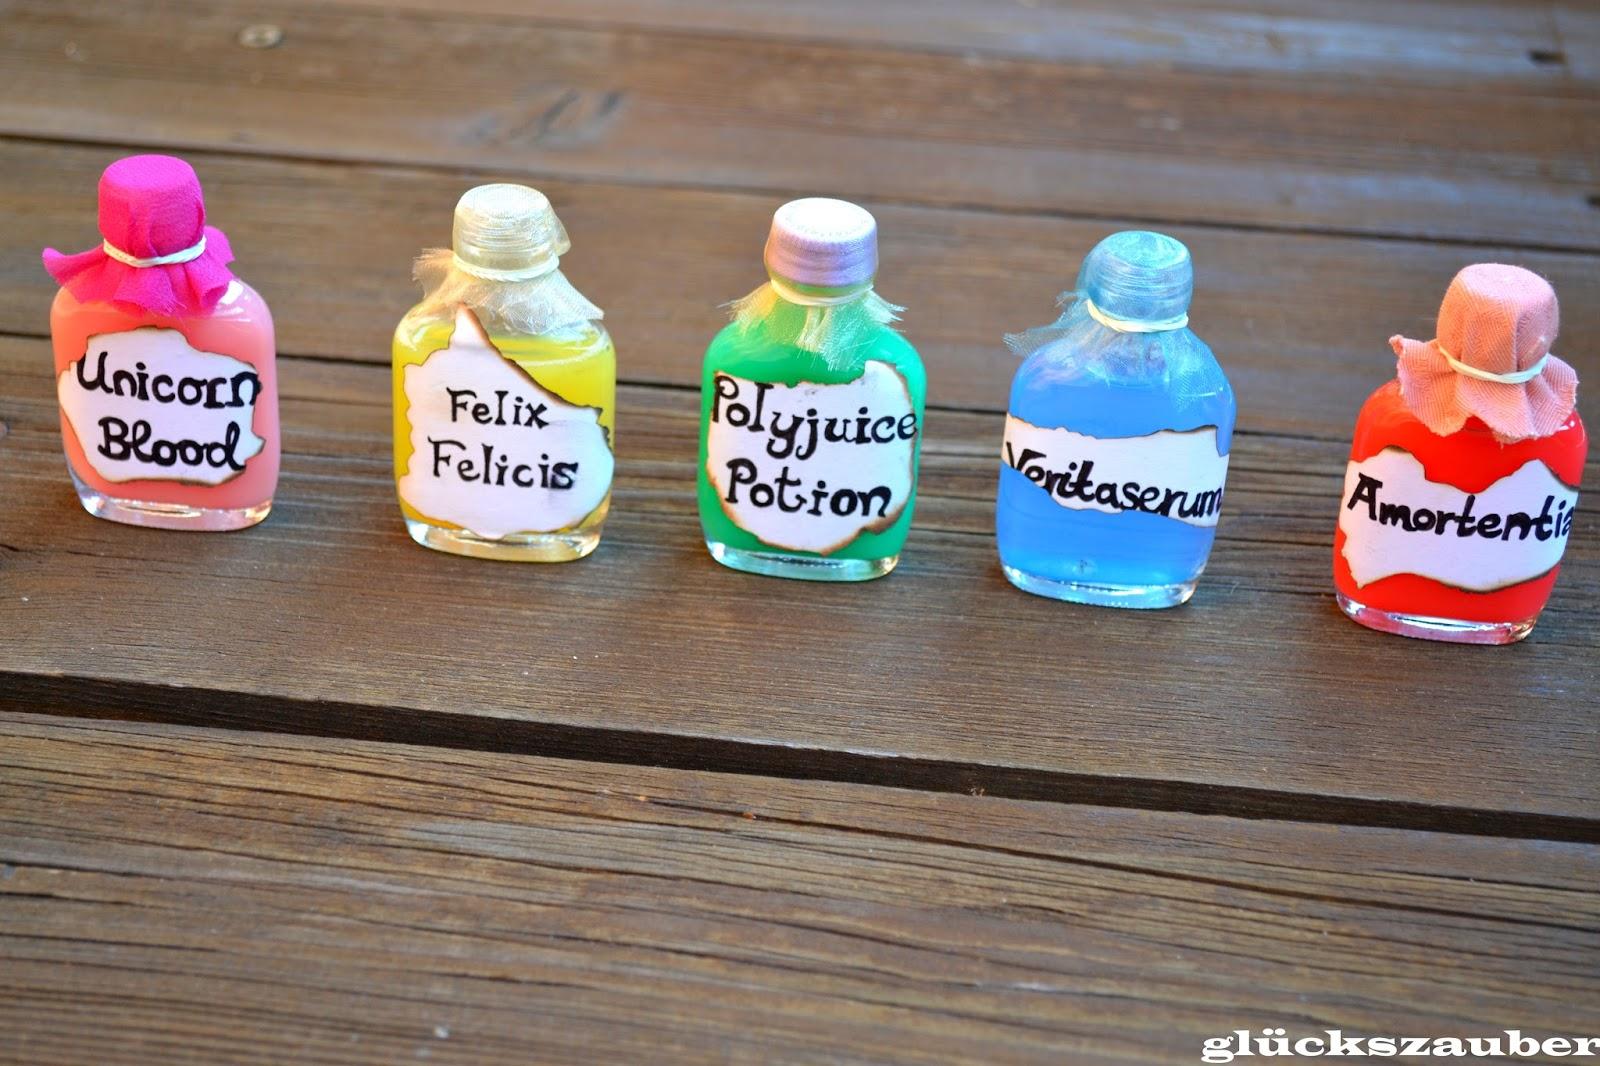 glückszauber : Diy: Harry Potter Dekoration (Zaubertrank-Fläschen ...